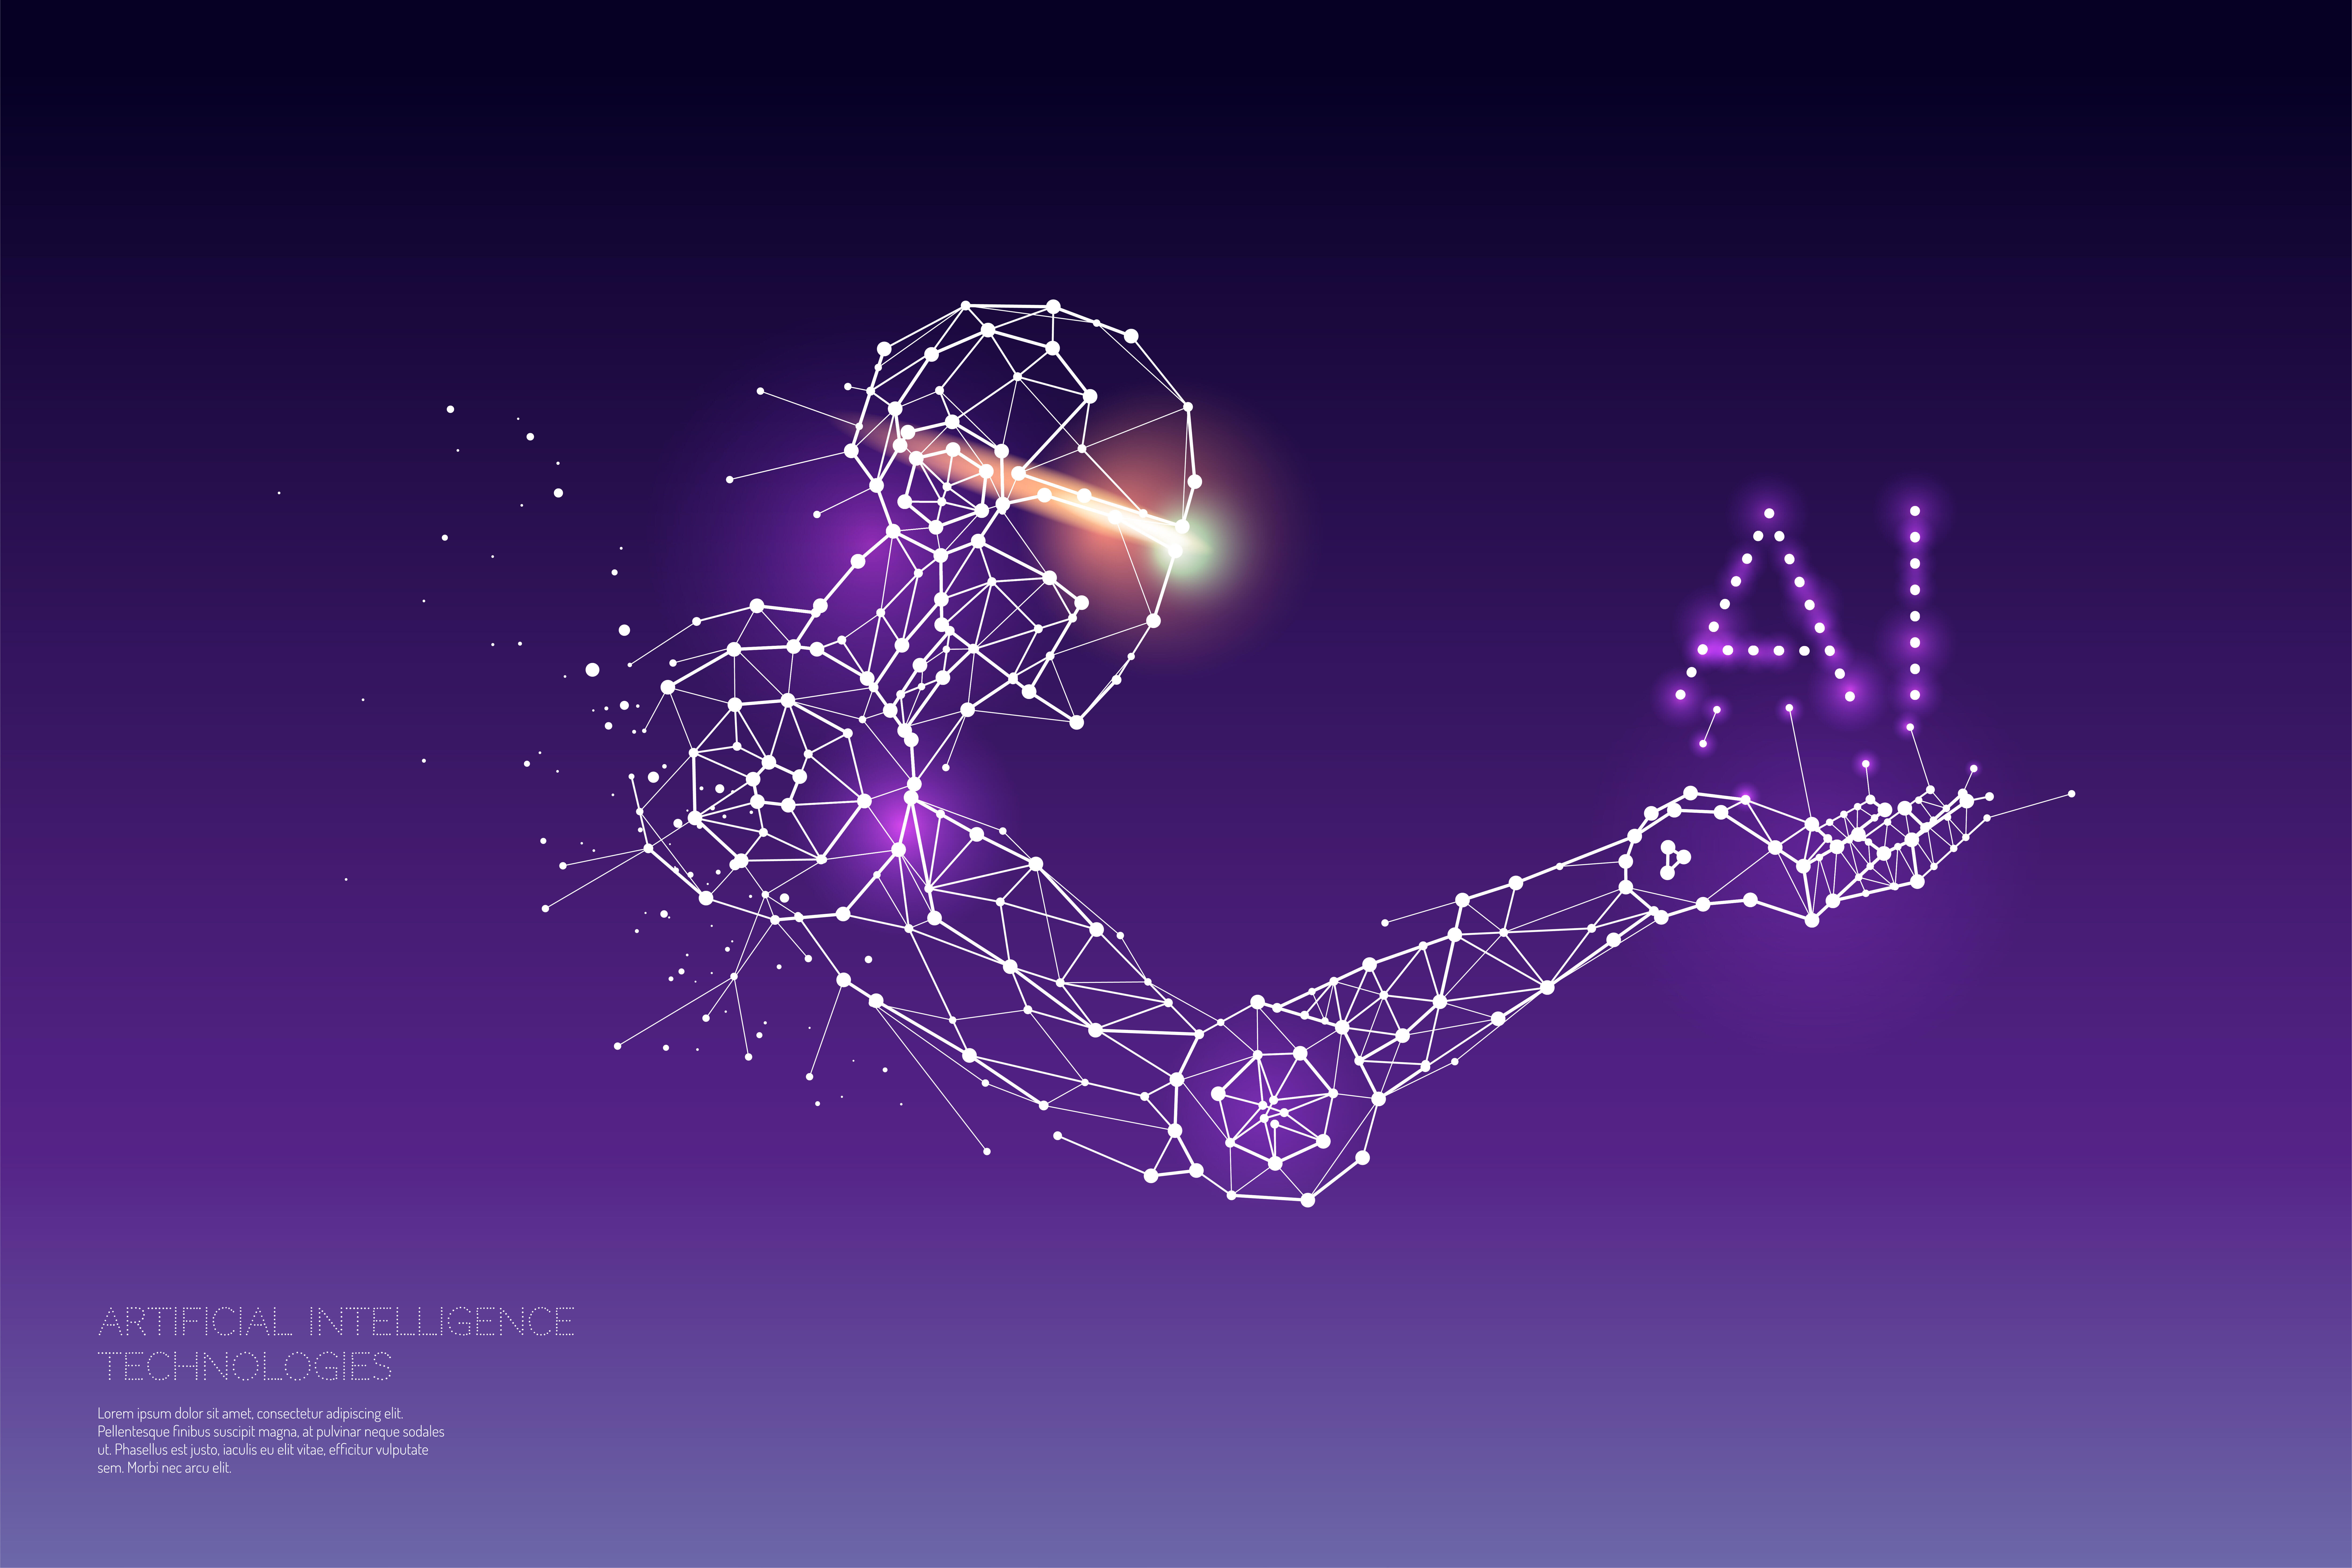 AI helping companies analyze data.